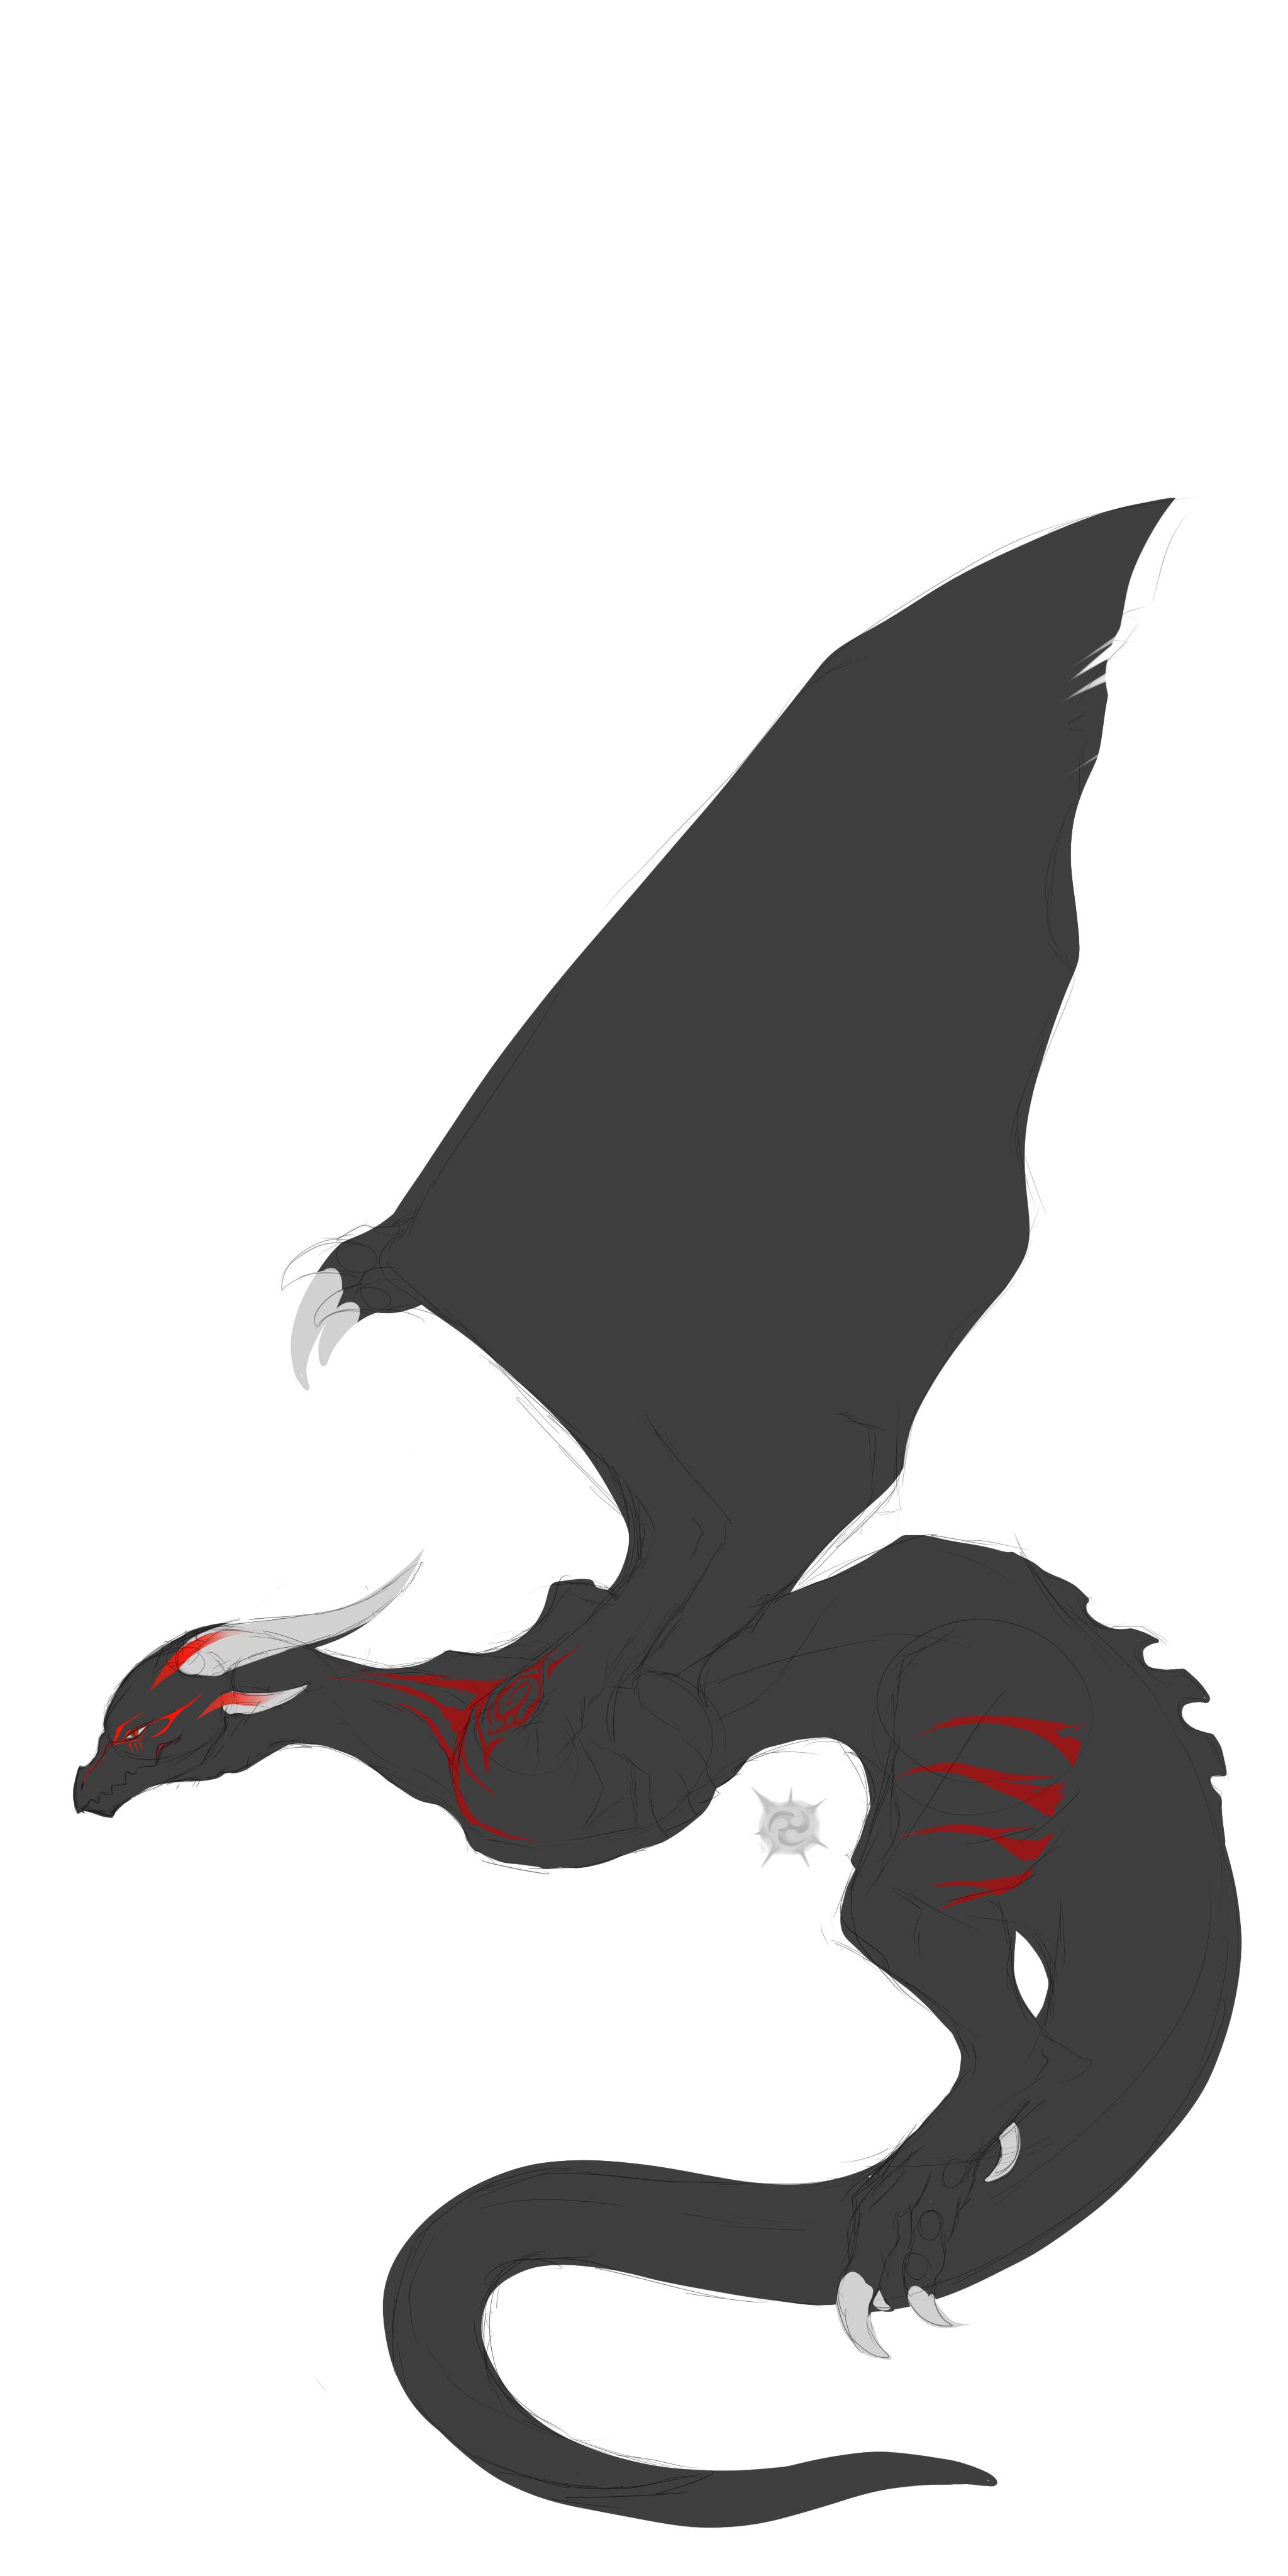 Dragon design for Tee-Kay by UZL-2S